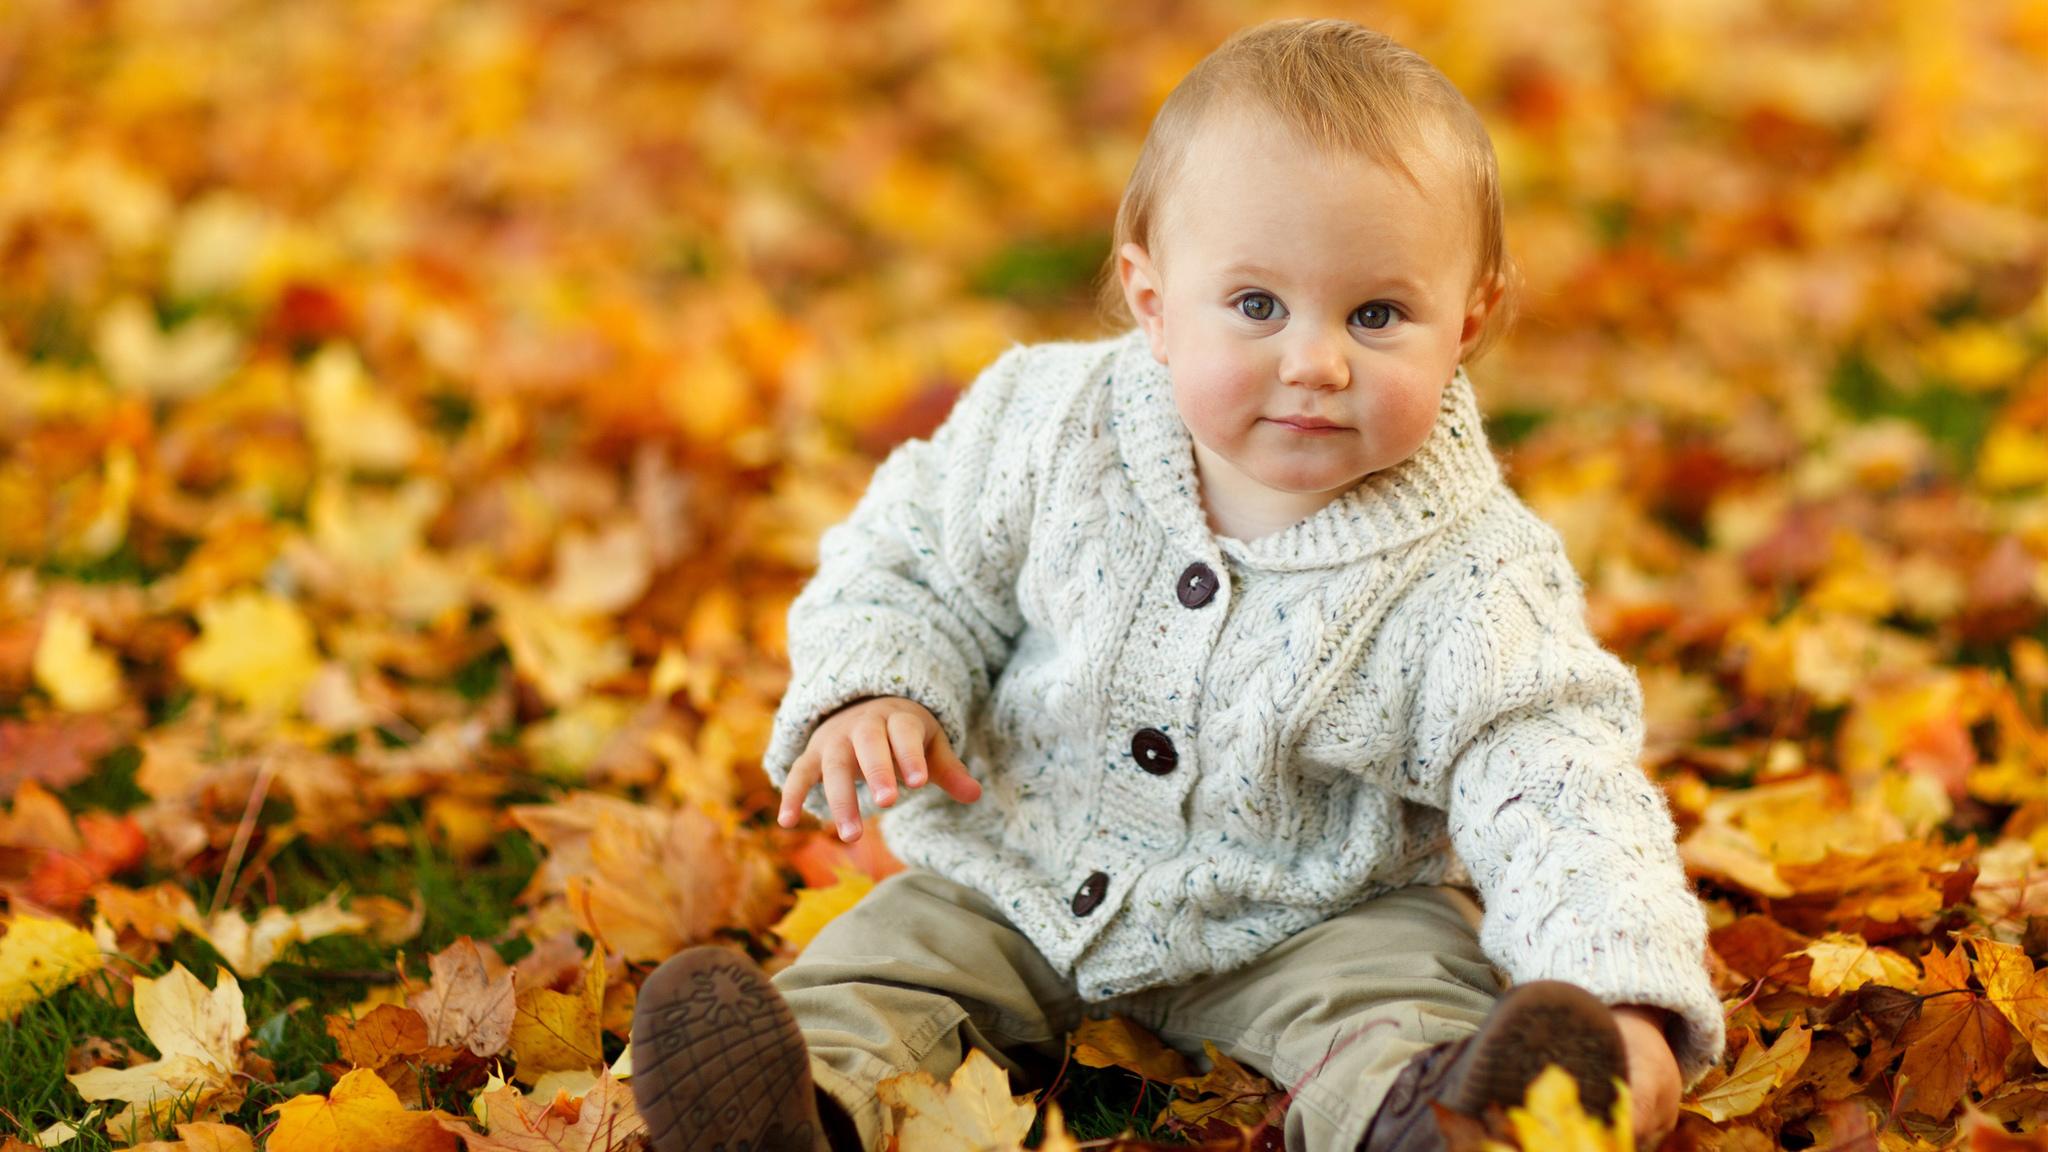 Cute Baby Boy Autumn Leaves (2048x1152)